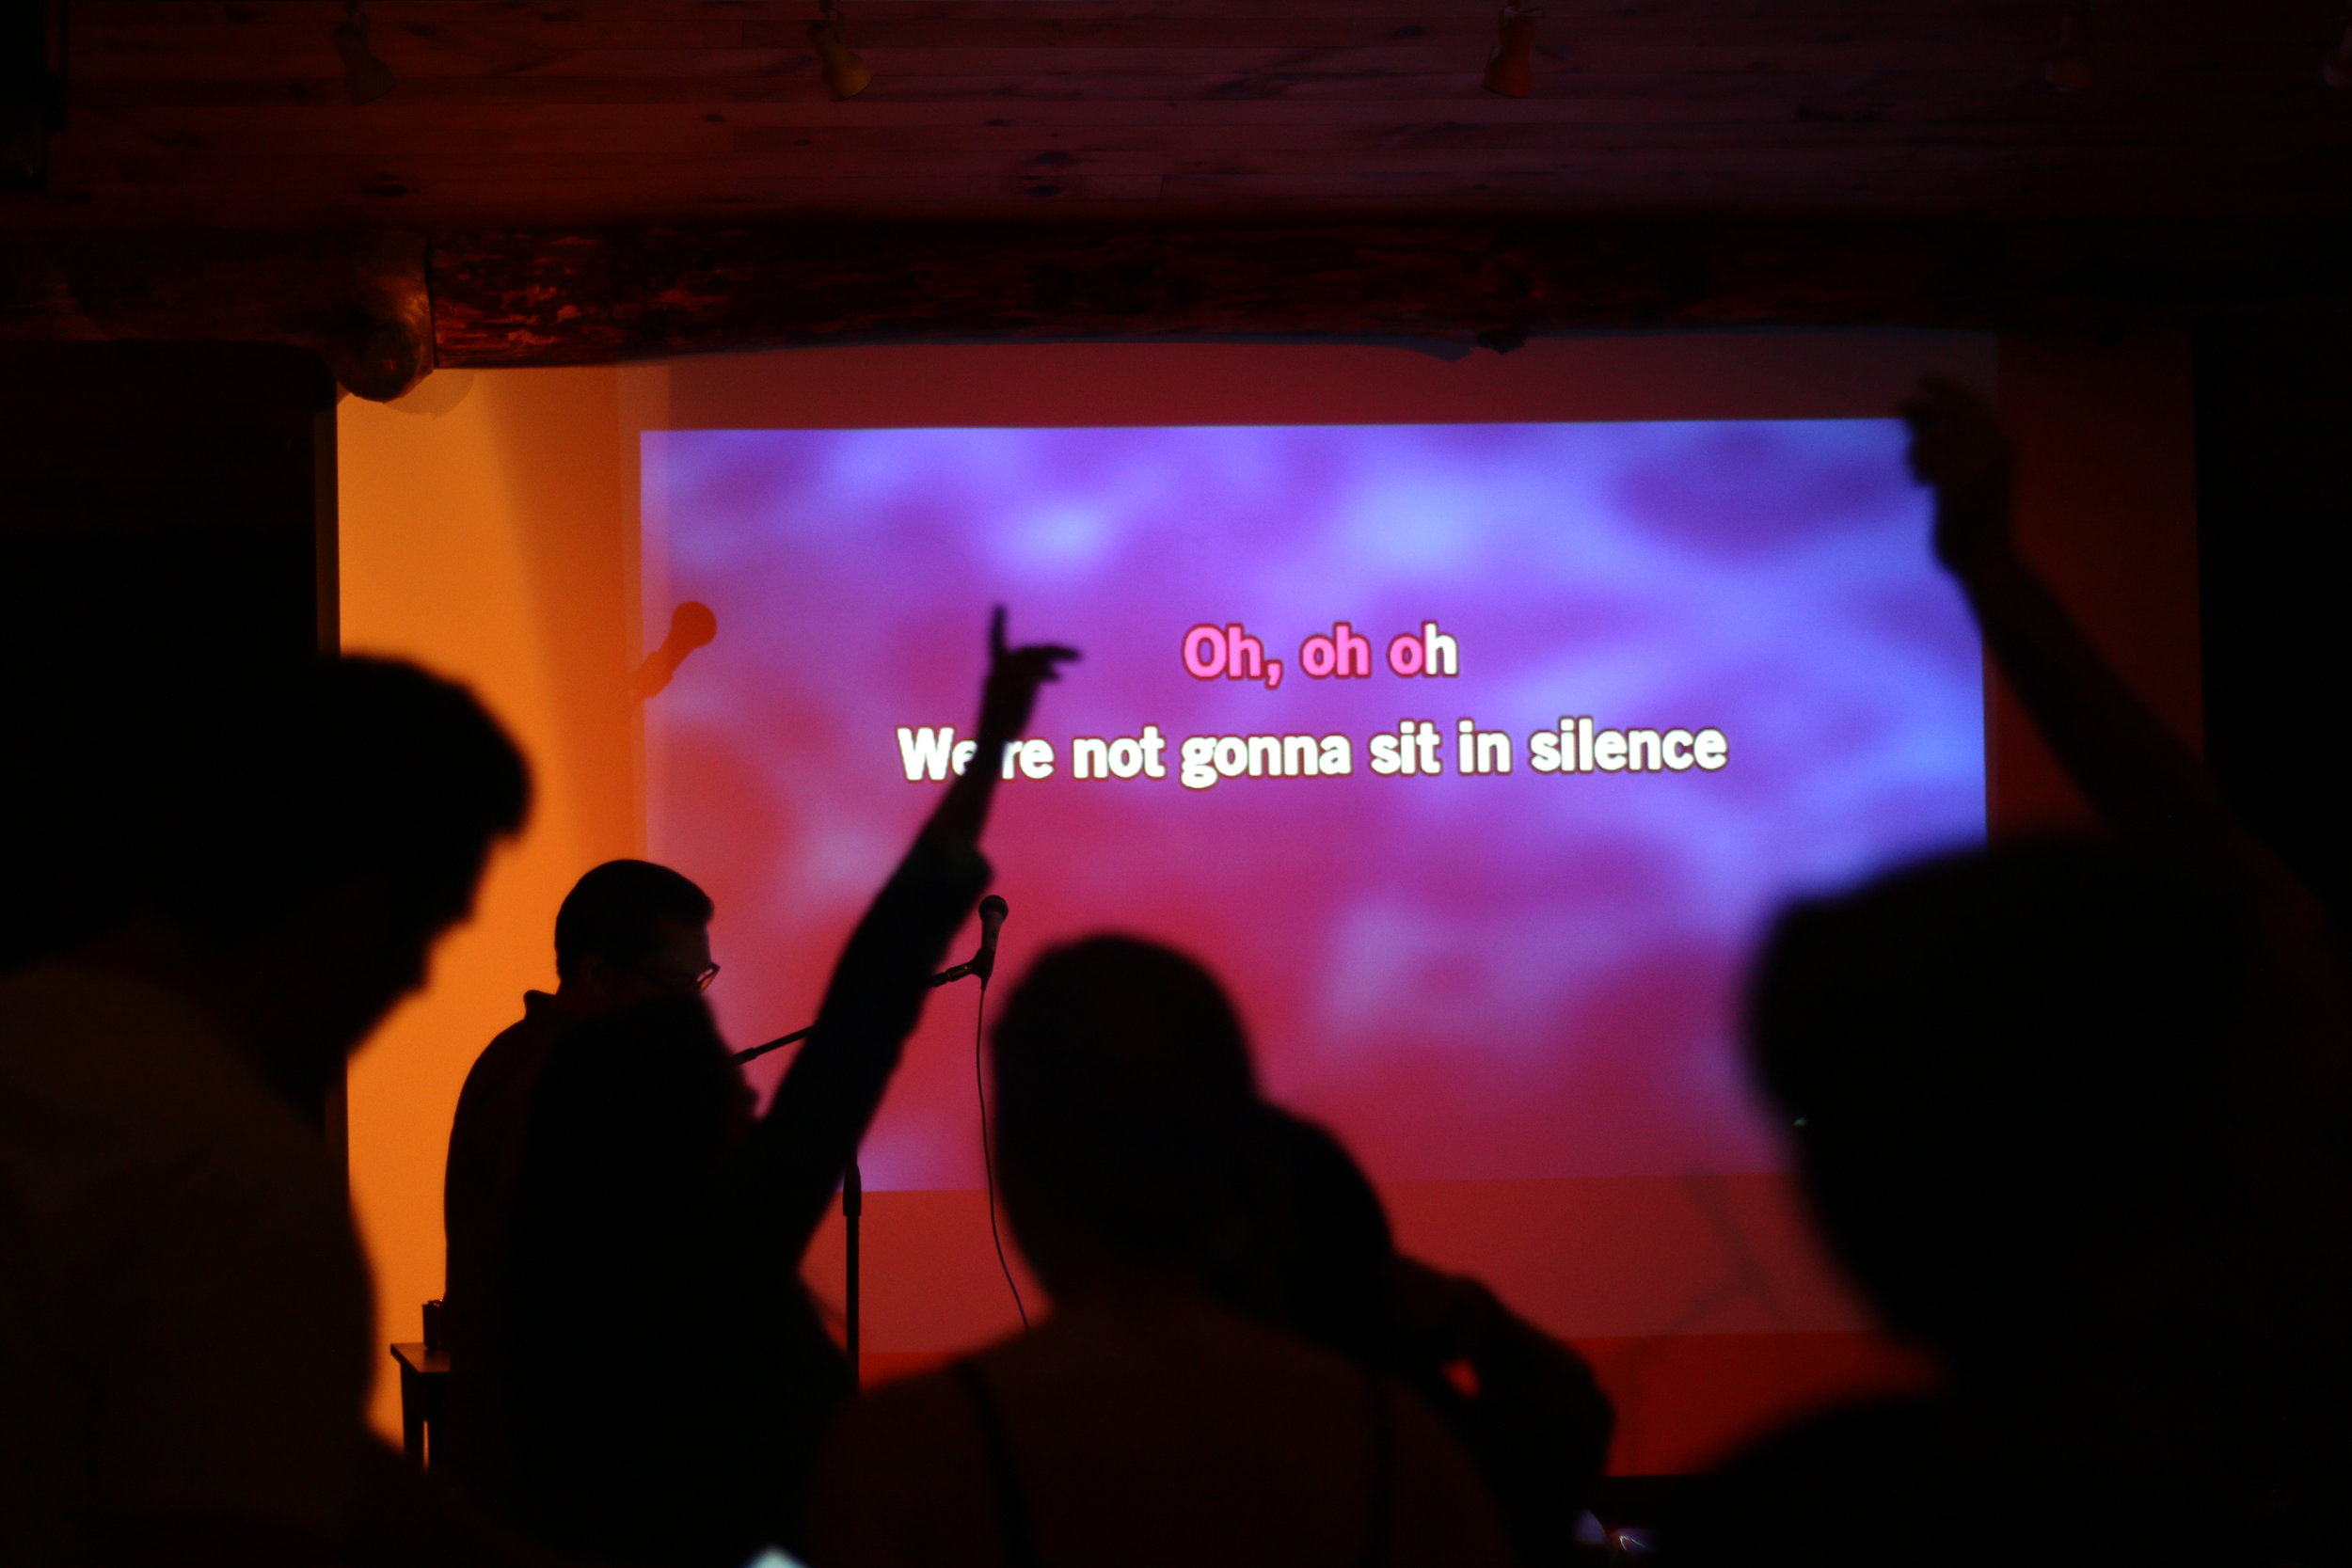 🎤 Camp Karaoke 🎤